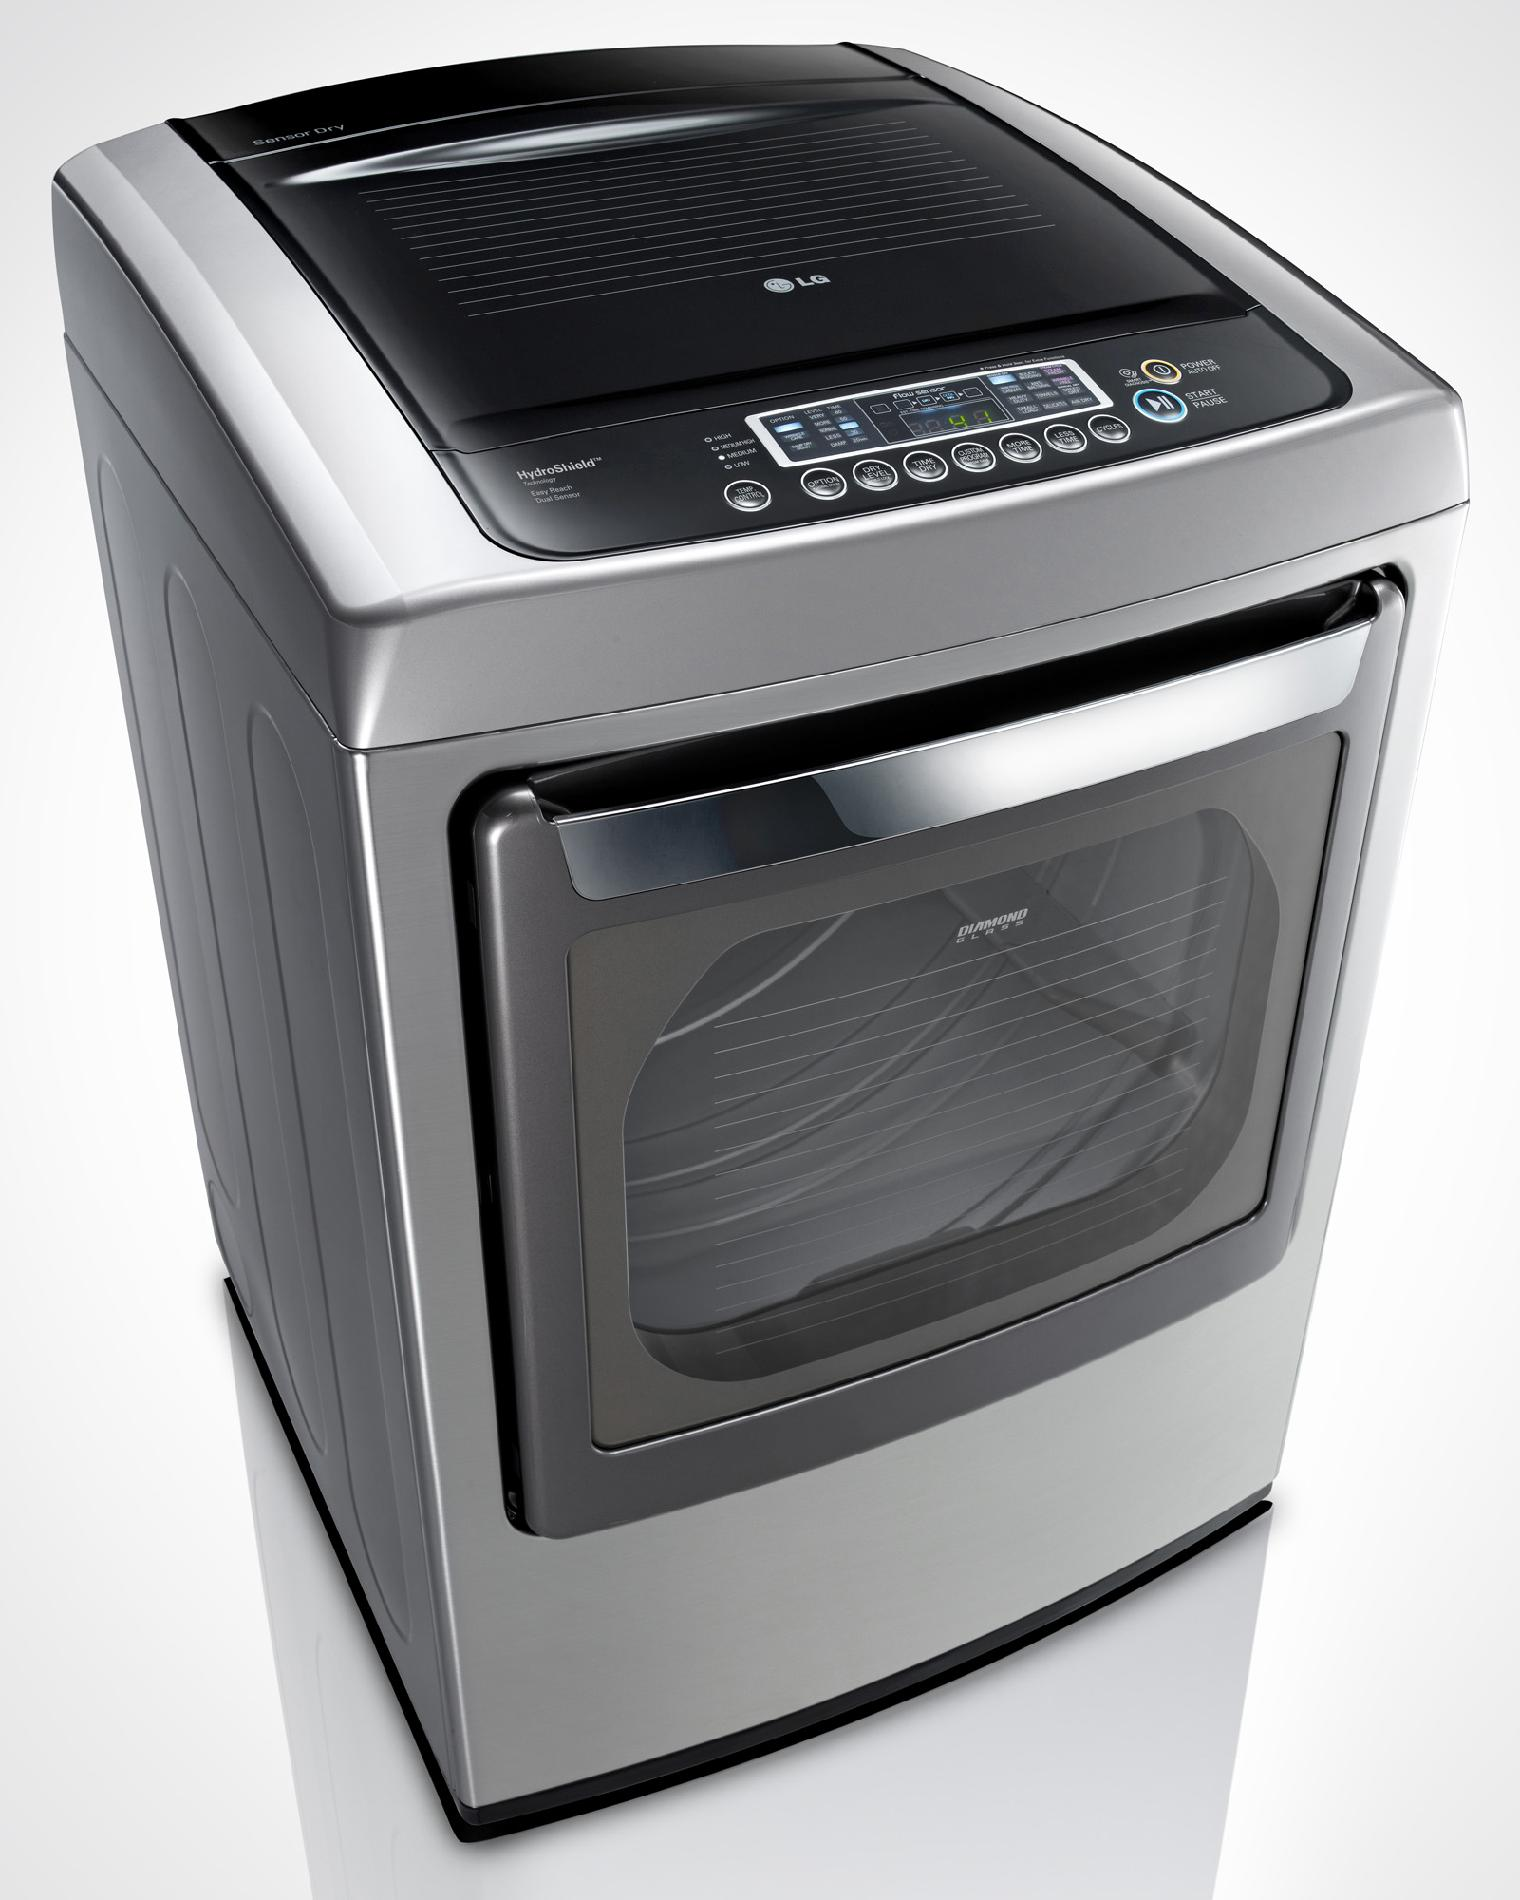 LG 7.3 cu. ft. Electric Dryer w/ SteamFresh™ - Graphite Steel